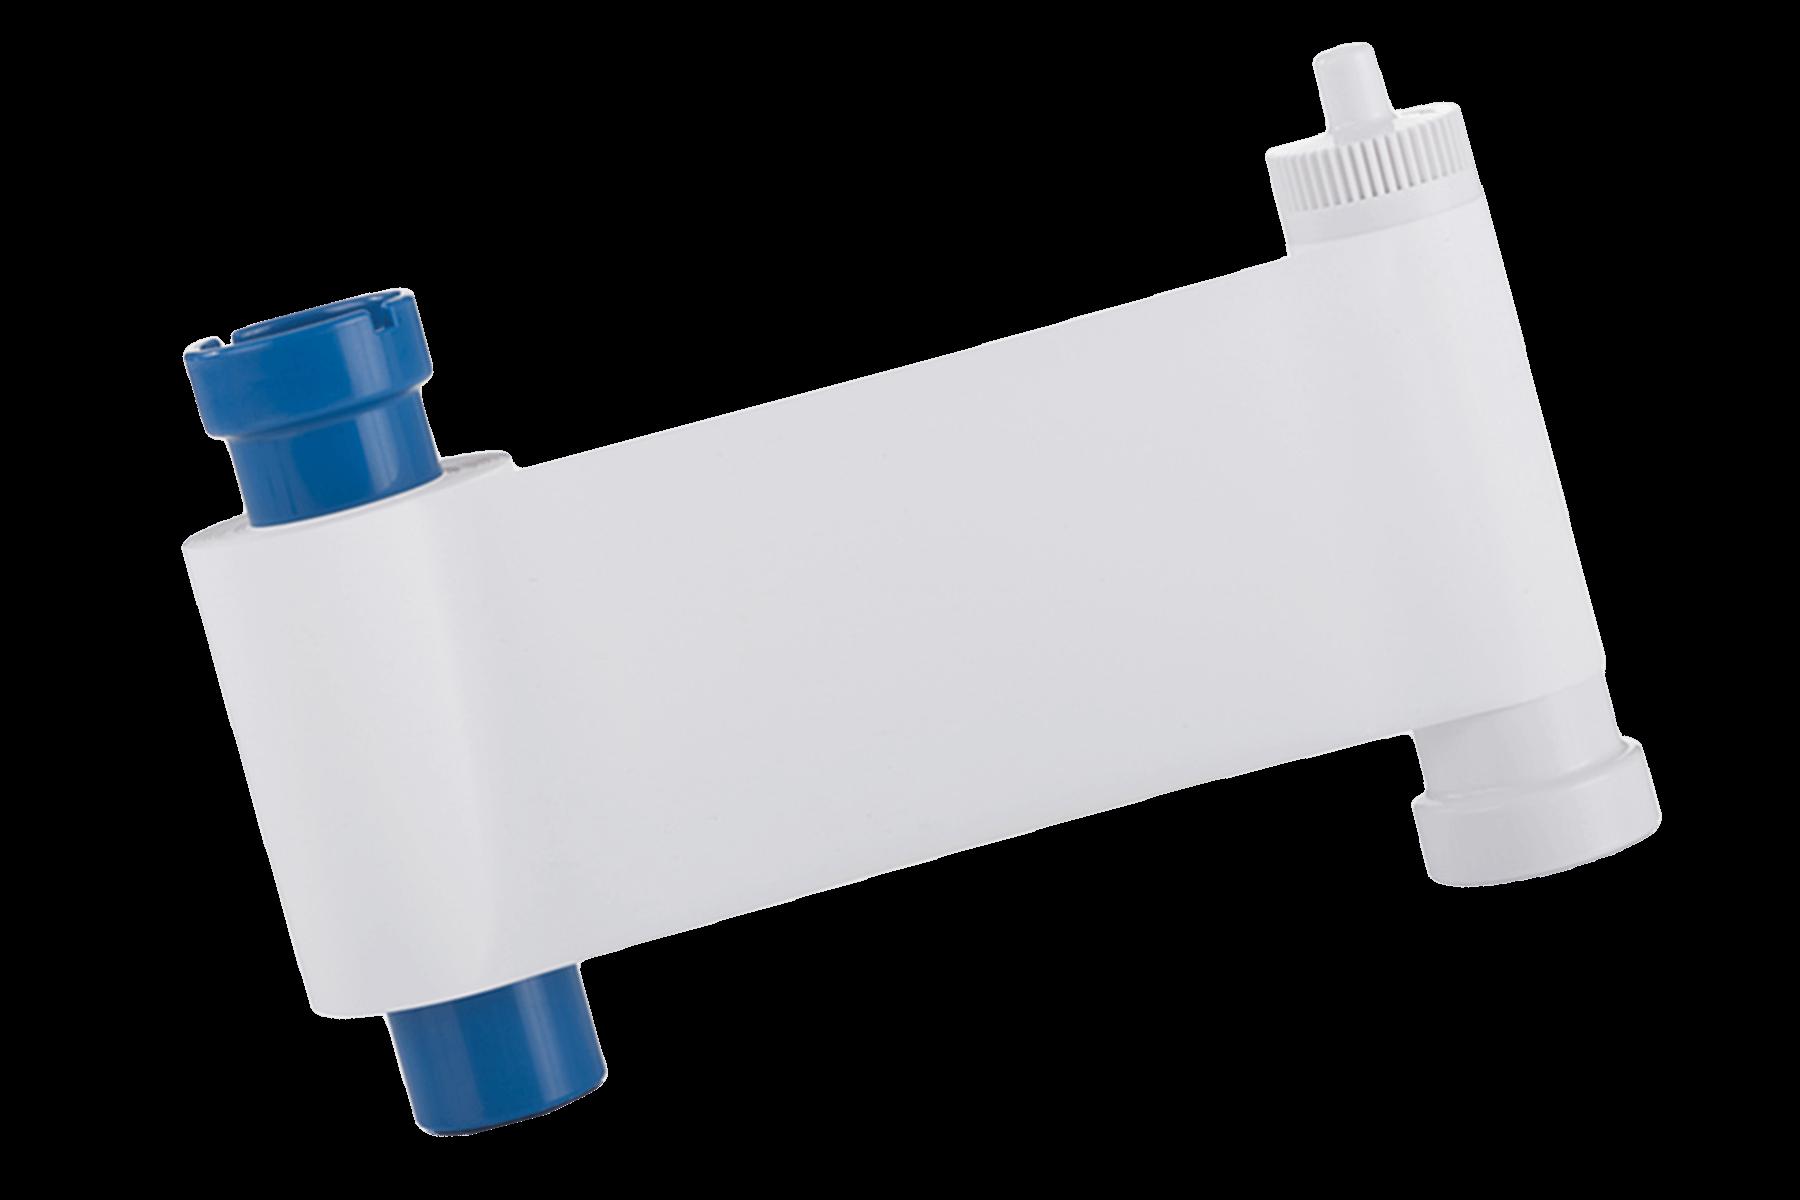 Monochrome white ribbon for PriceCardPro printers